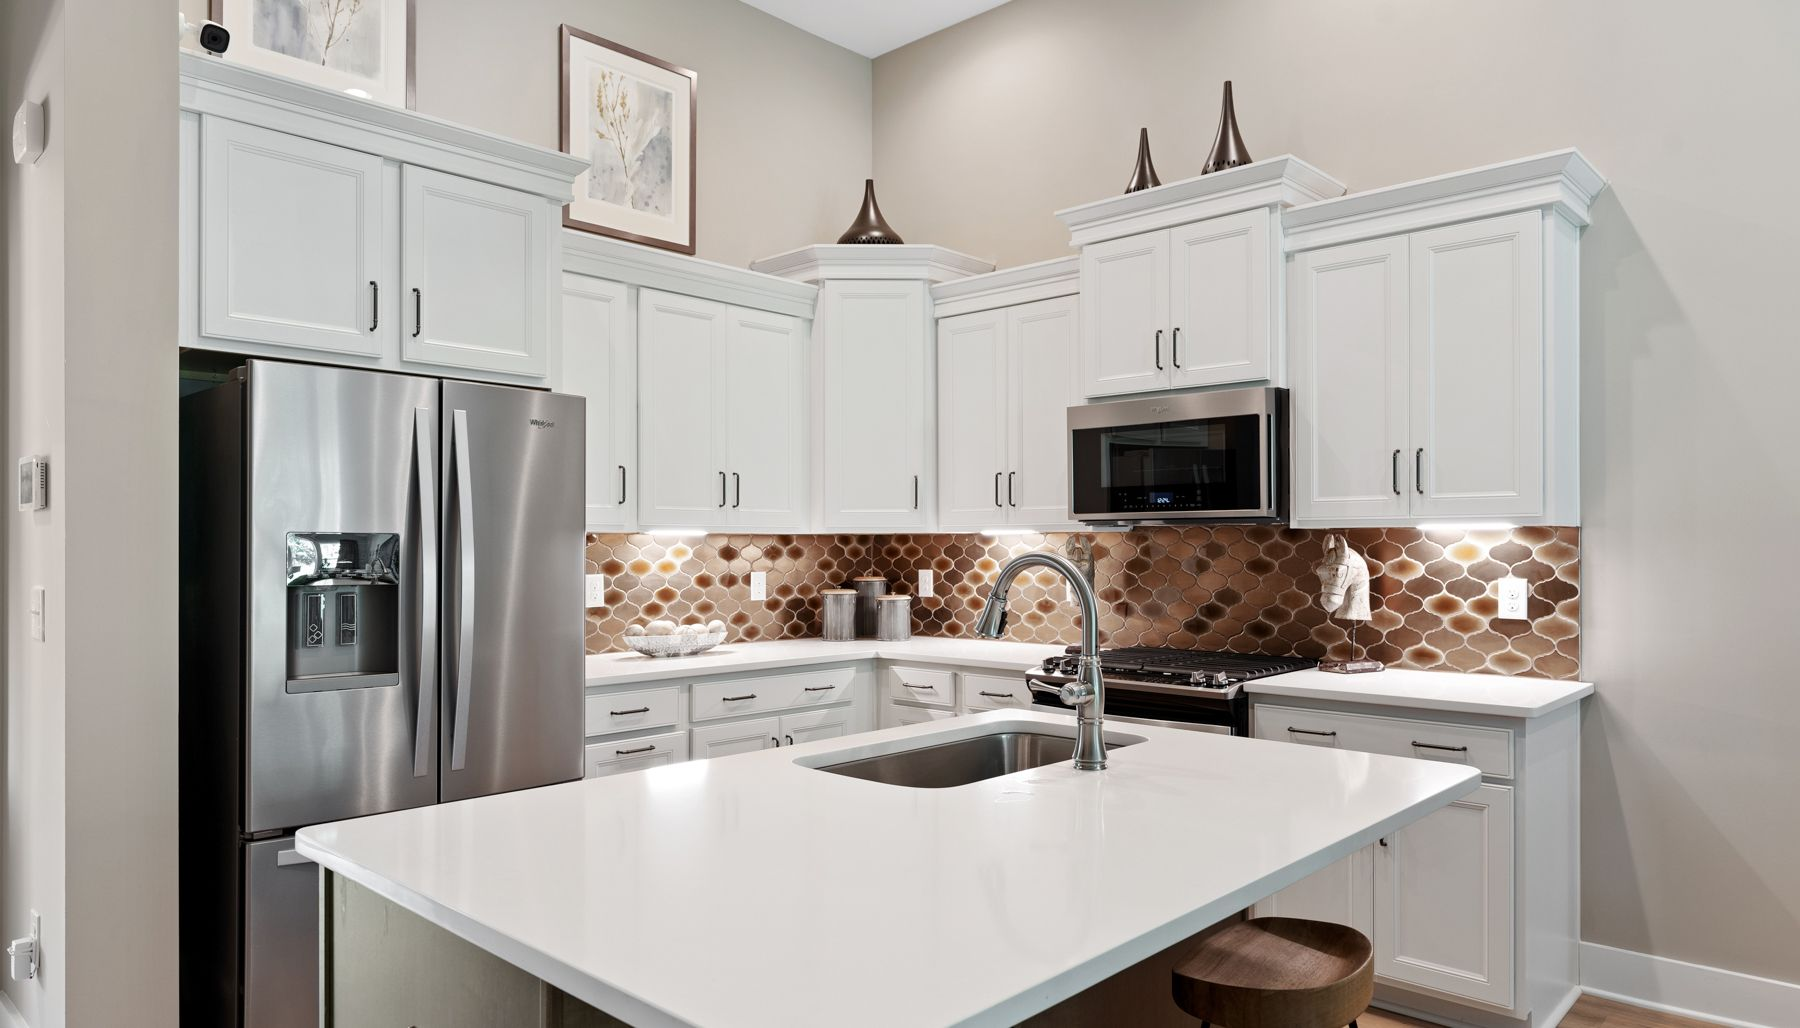 Kitchen featured in the Summit By Dan Ryan Builders in Greenville-Spartanburg, SC